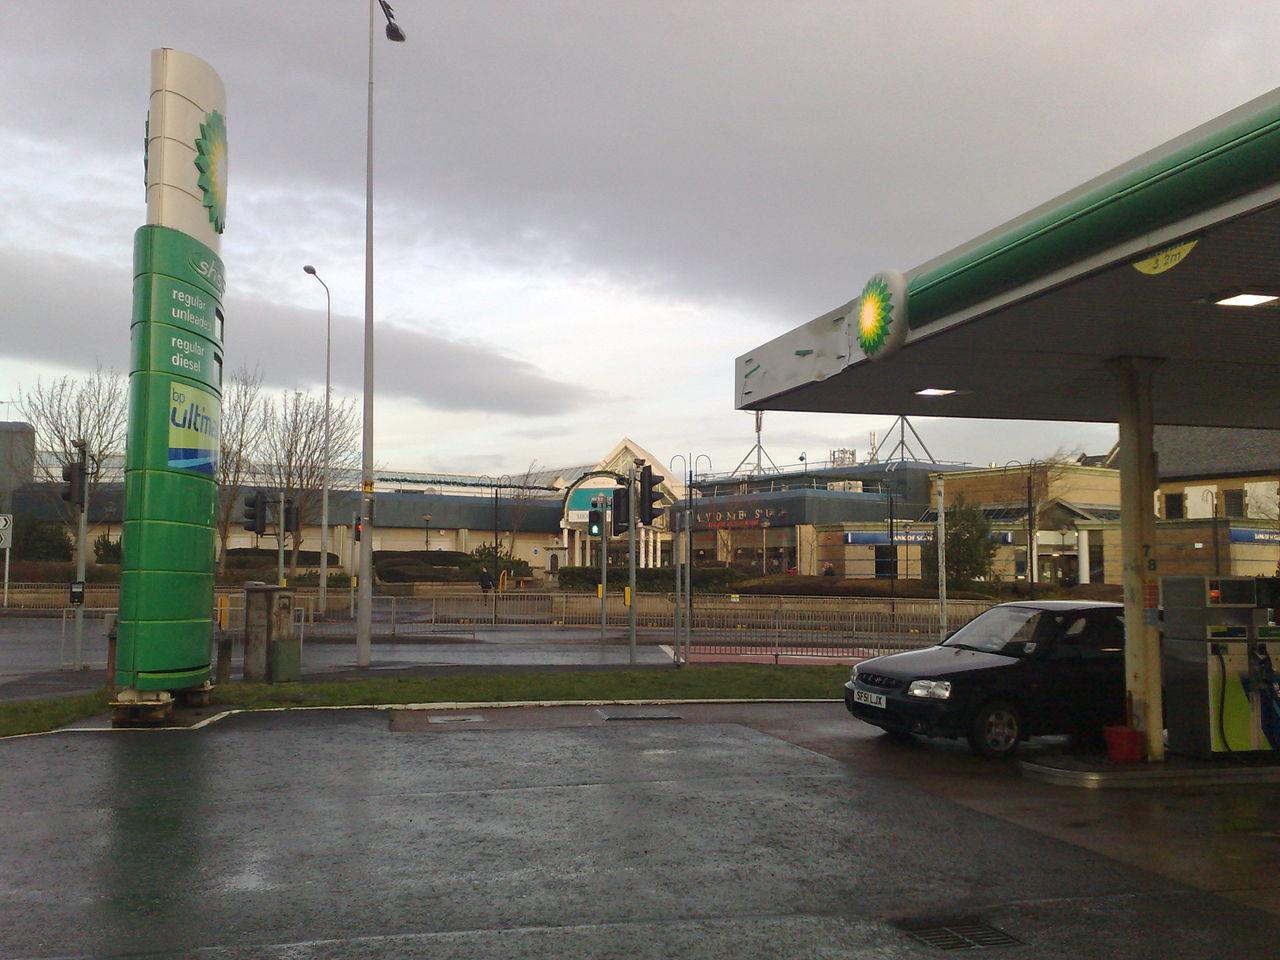 My Mythic Mearns Cars Gas Station Petrol Station Rain Rental Car Shopping Mall